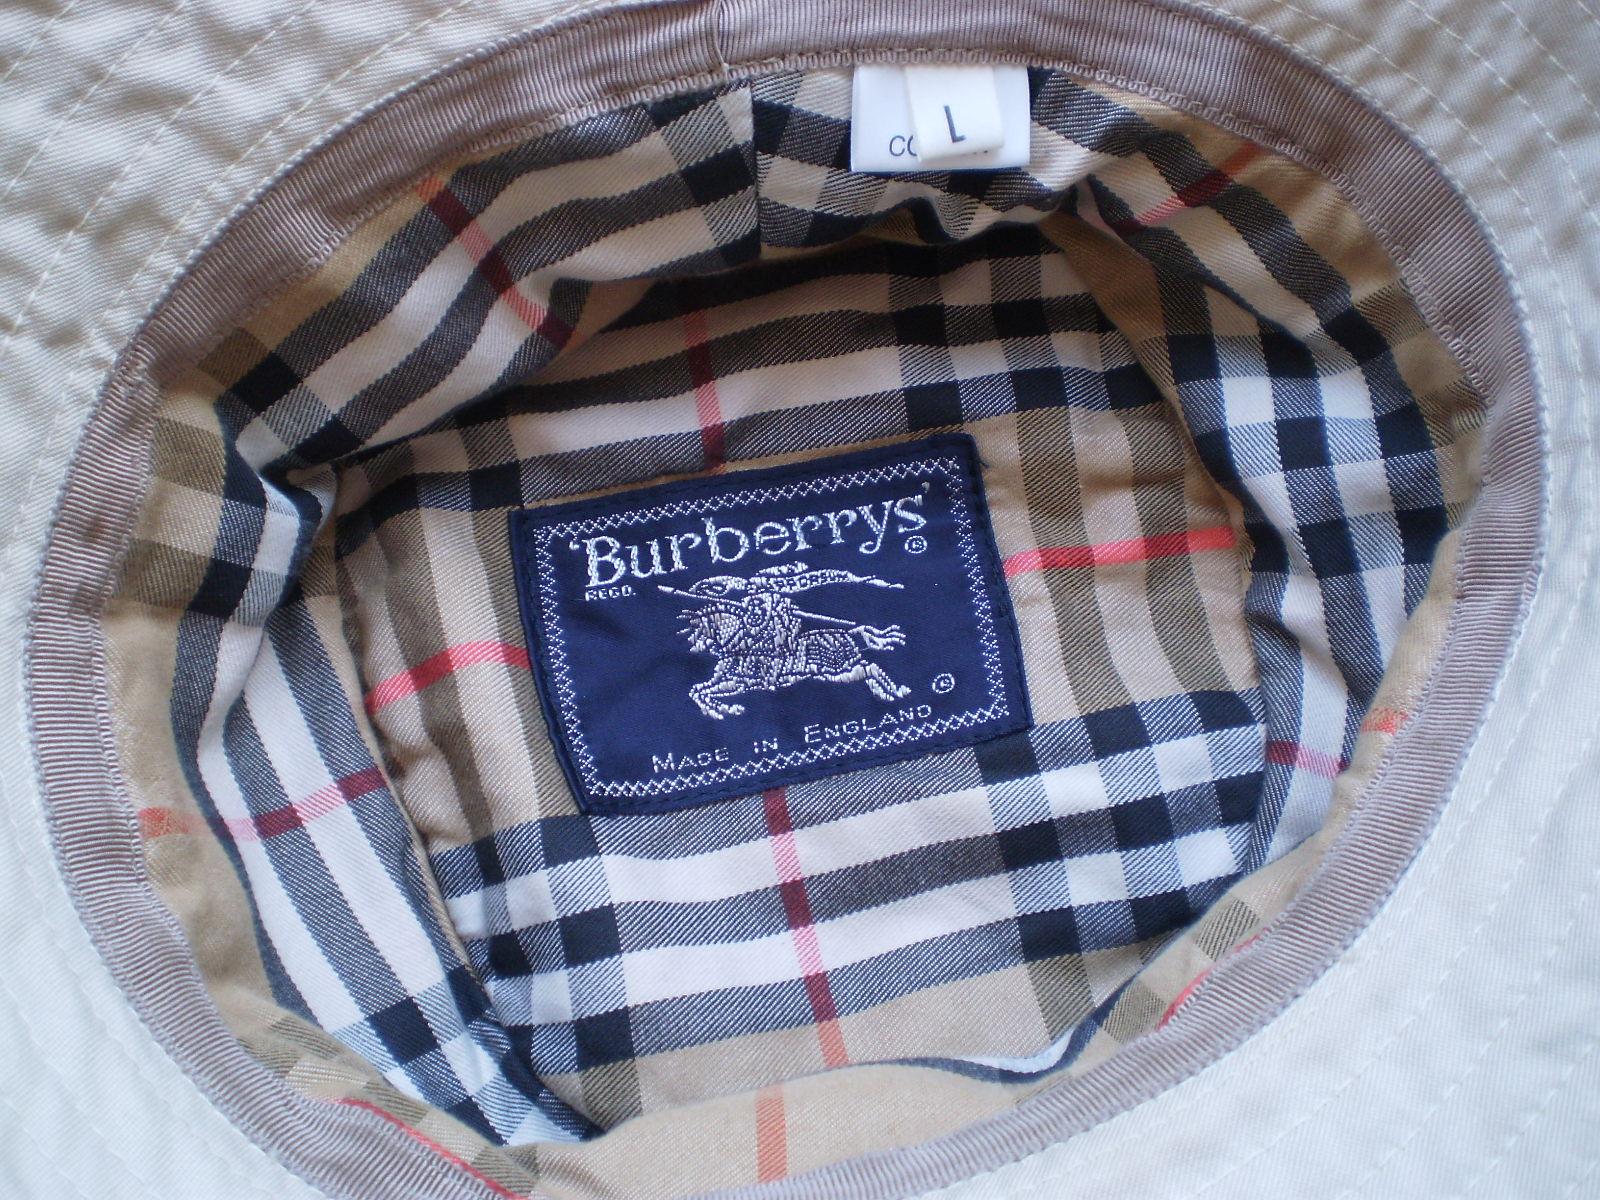 BURBERRY'S ___ kapelusz *** L --- 59 cm